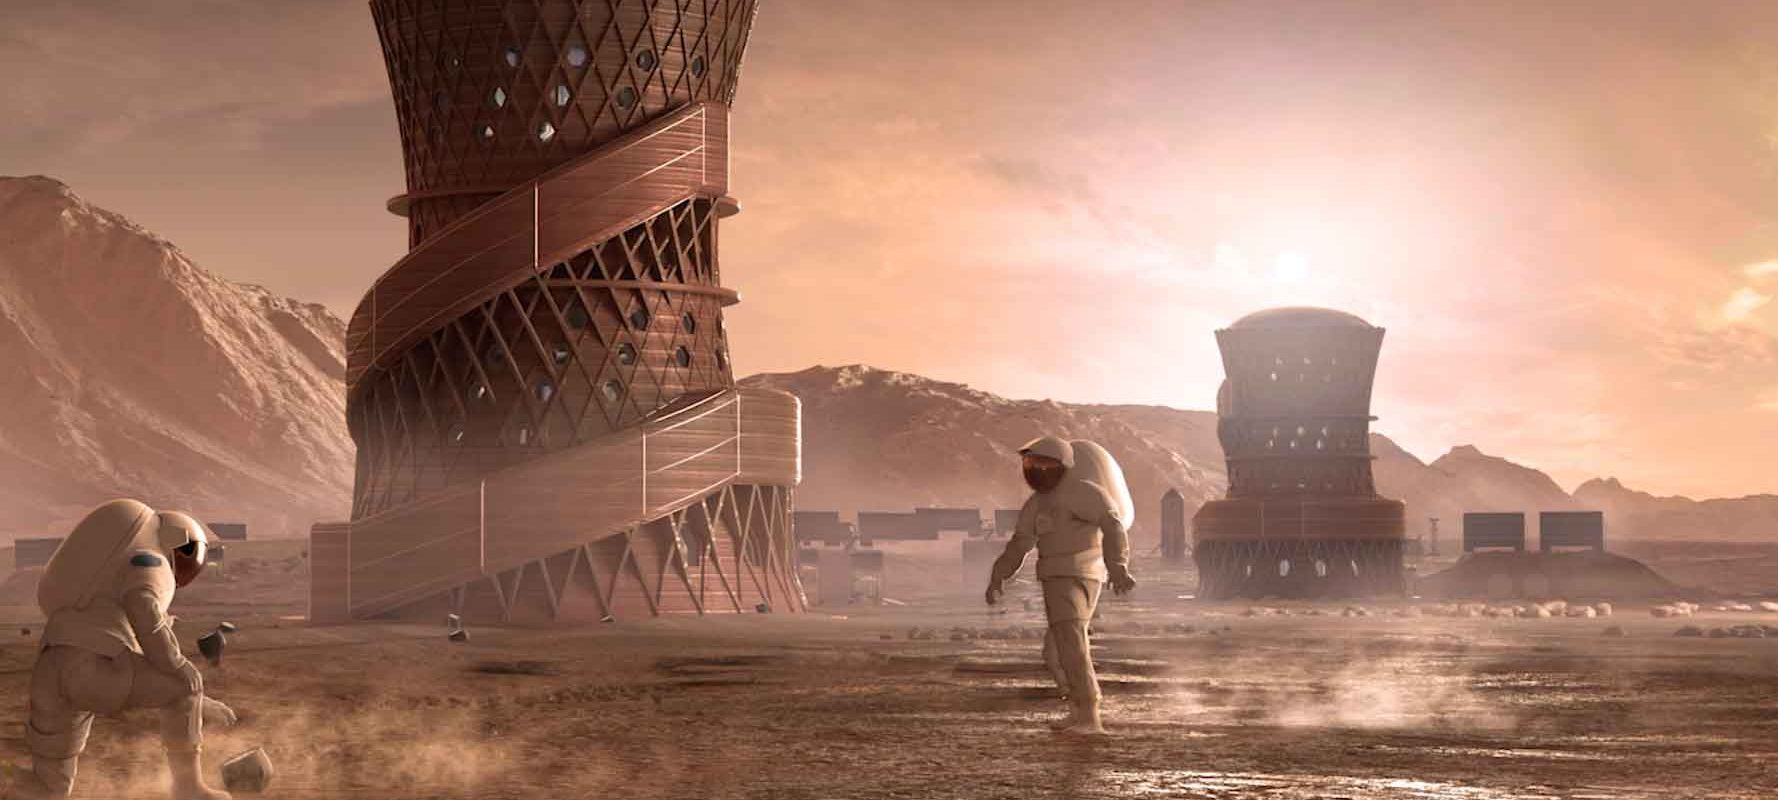 NASA's 3D-Printed Habitat Challenge